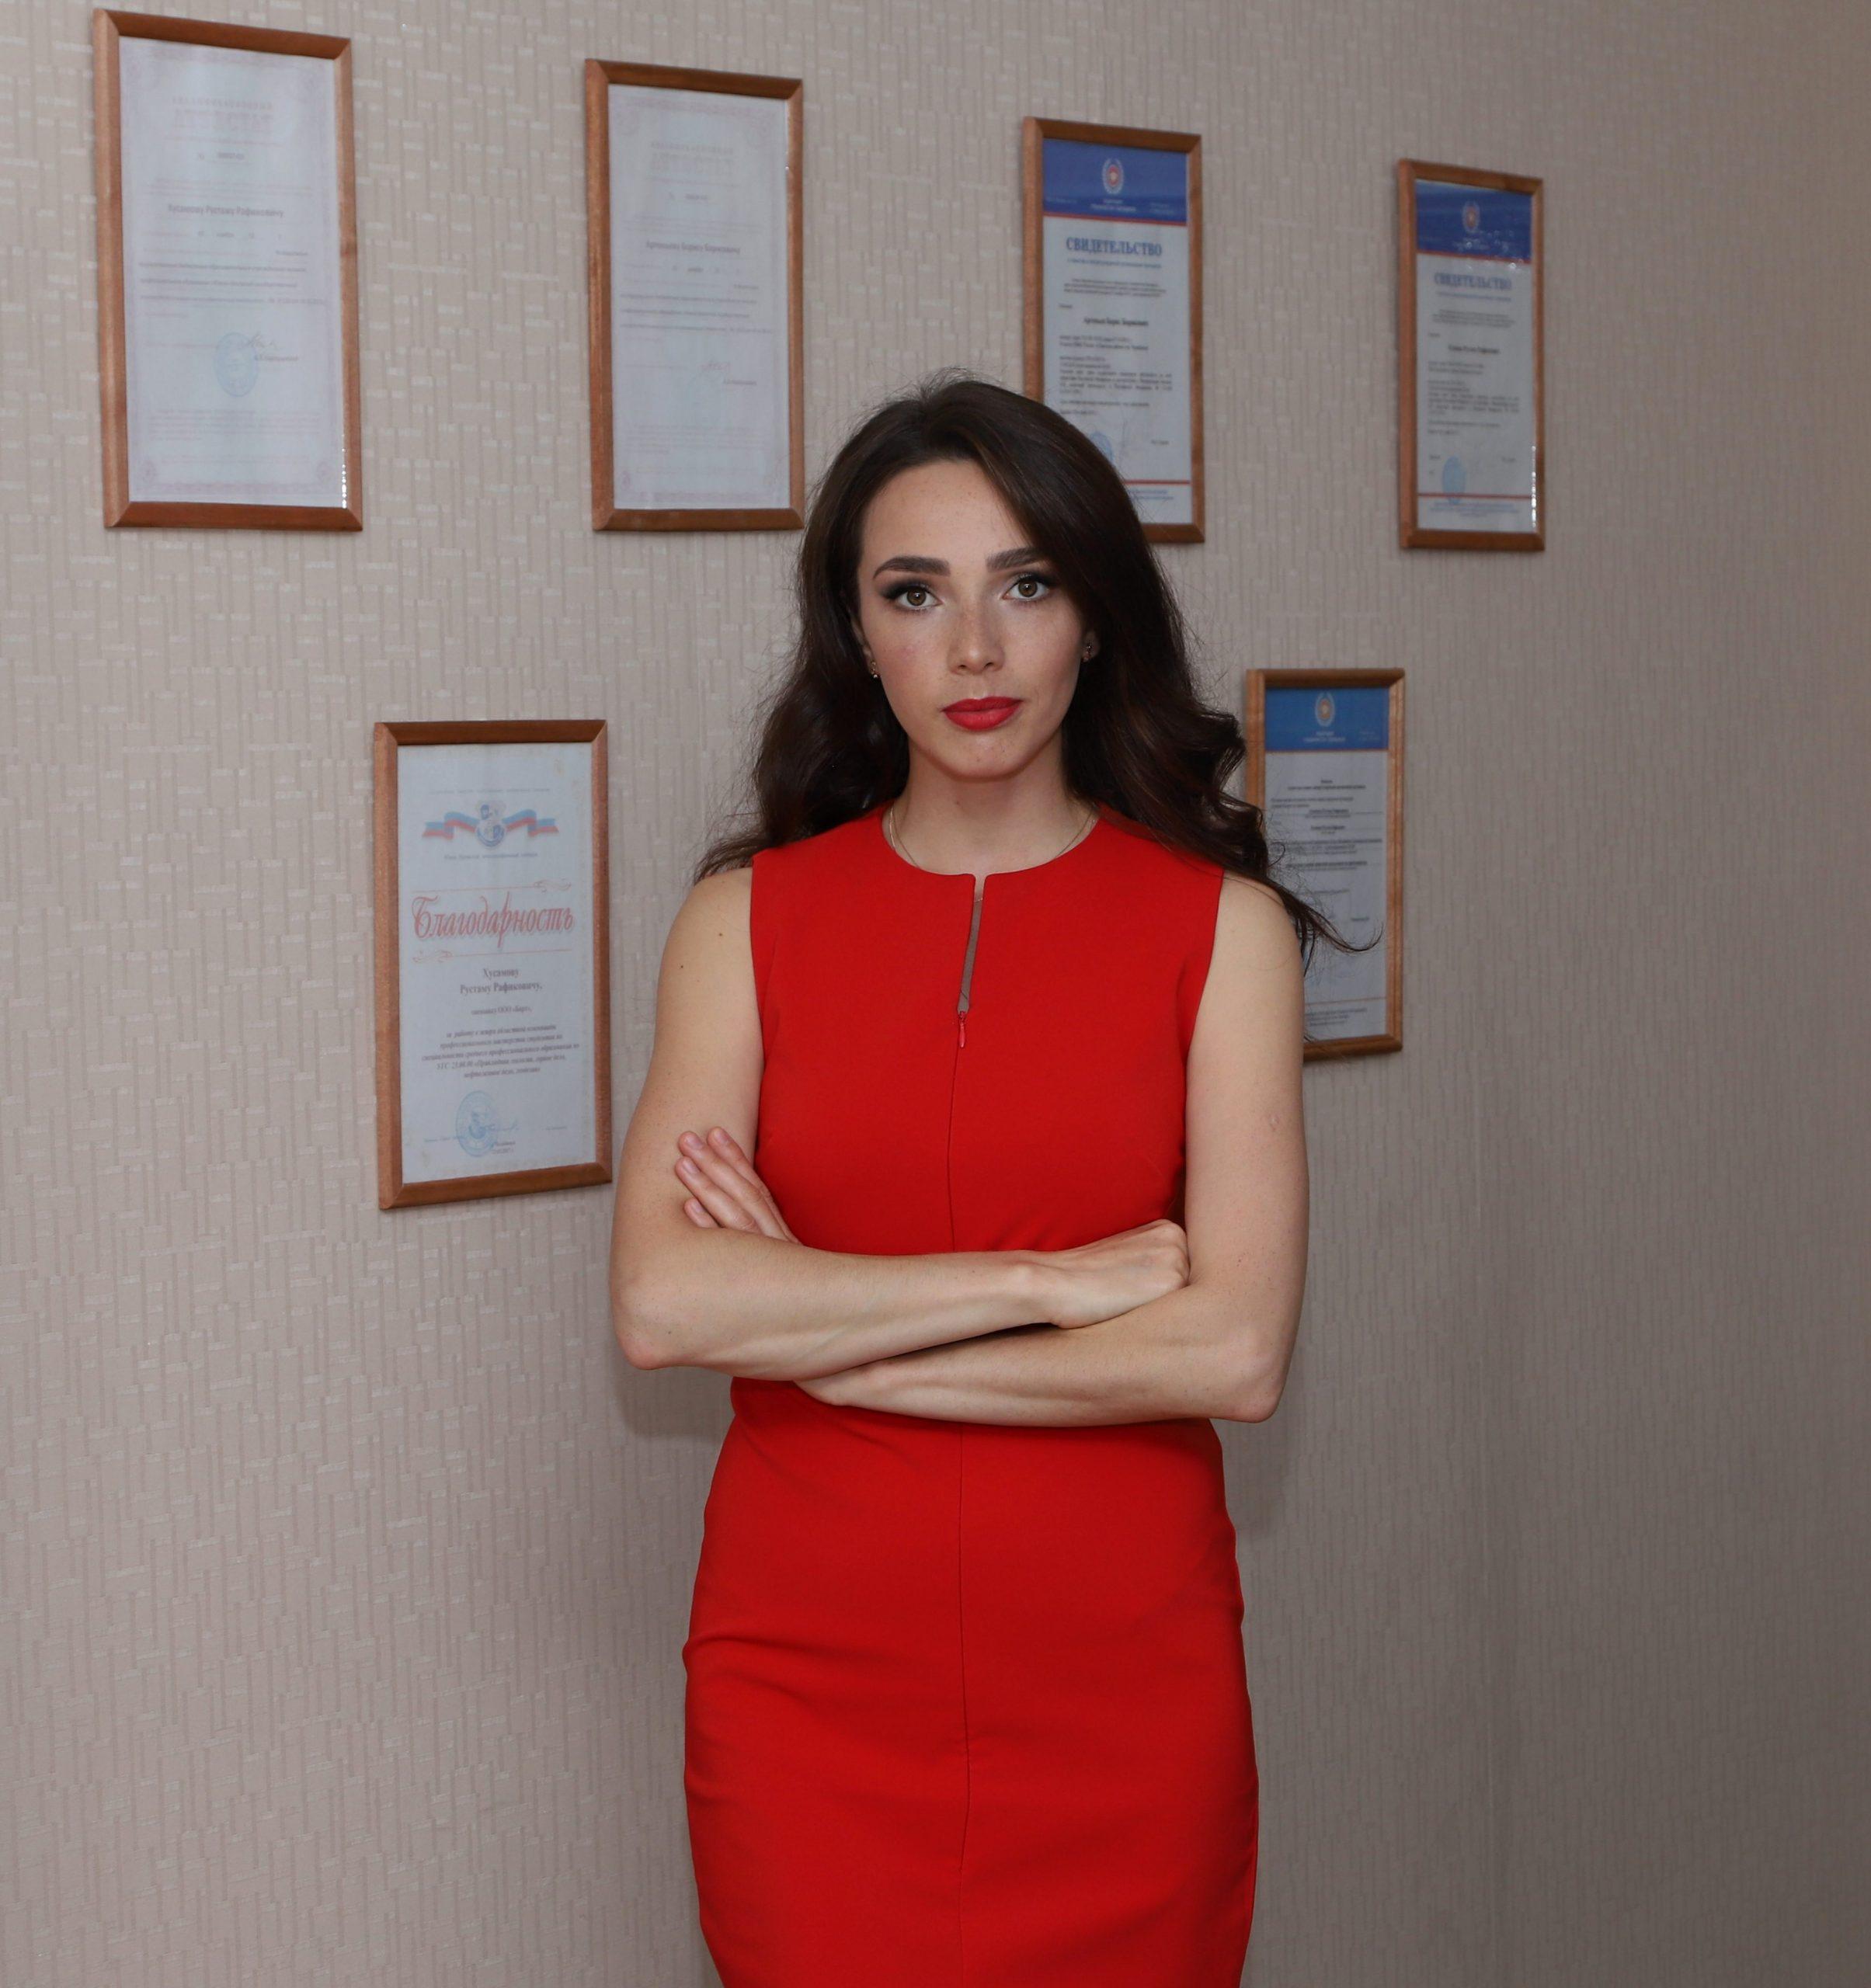 Хмелева Юлия Сергеевна